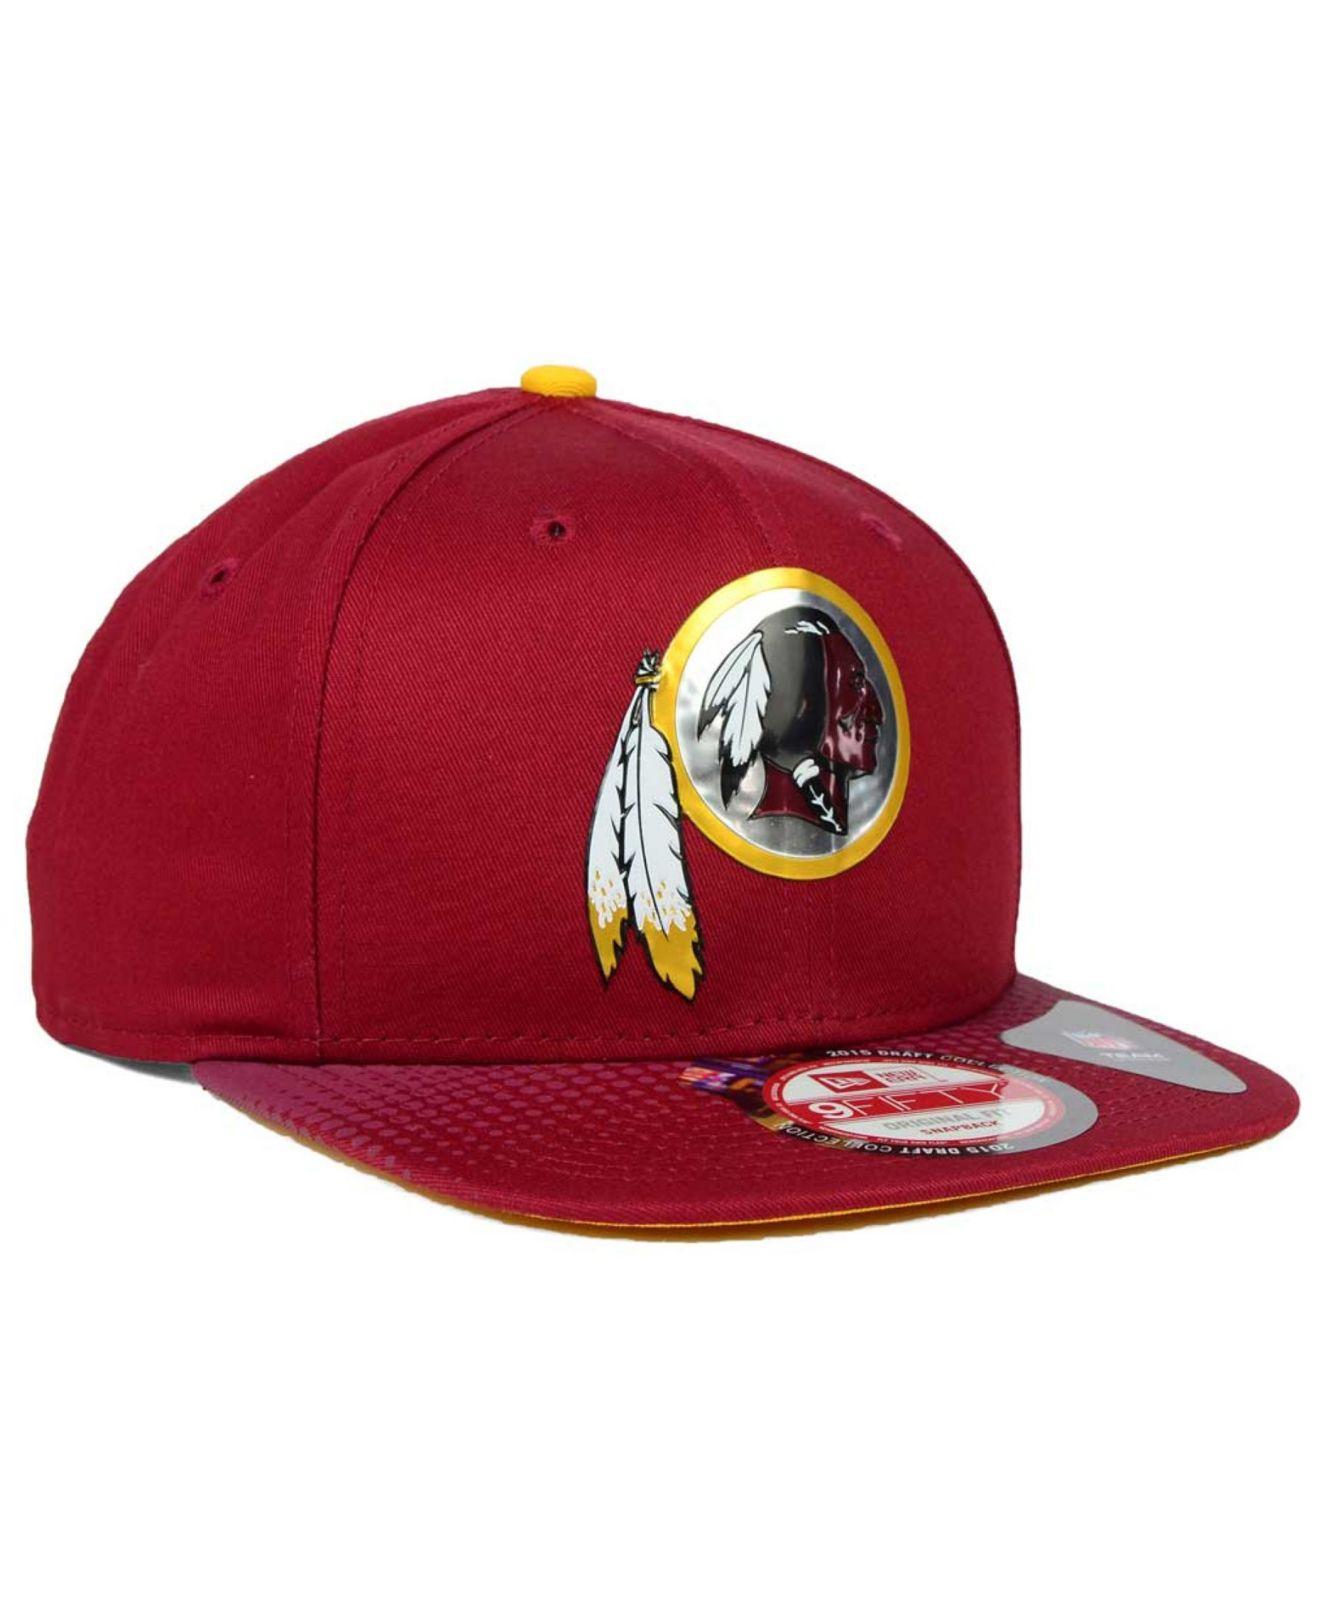 lowest price 3aa34 e5c50 good washington redskins new era 2018 nfl draft pick 9fifty snapback hat  mick simmons sport 4cce7 aab22  hot lyst ktz washington redskins 2015 nfl  draft ...